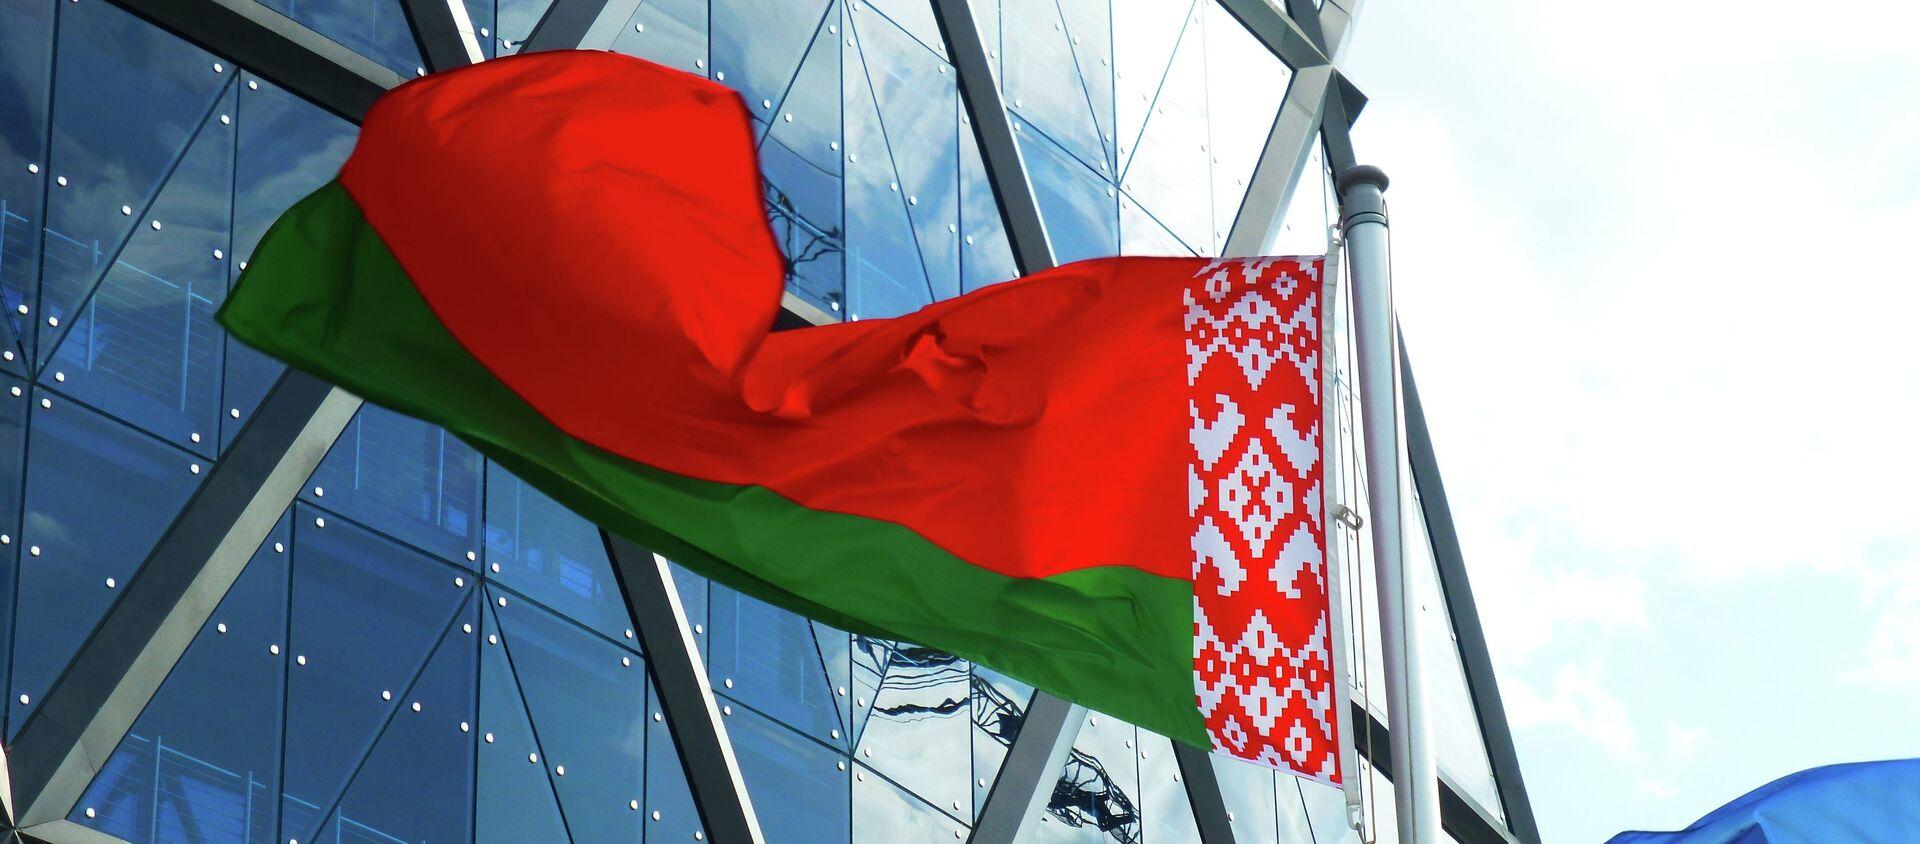 flaga białorusi - Sputnik Polska, 1920, 26.03.2021